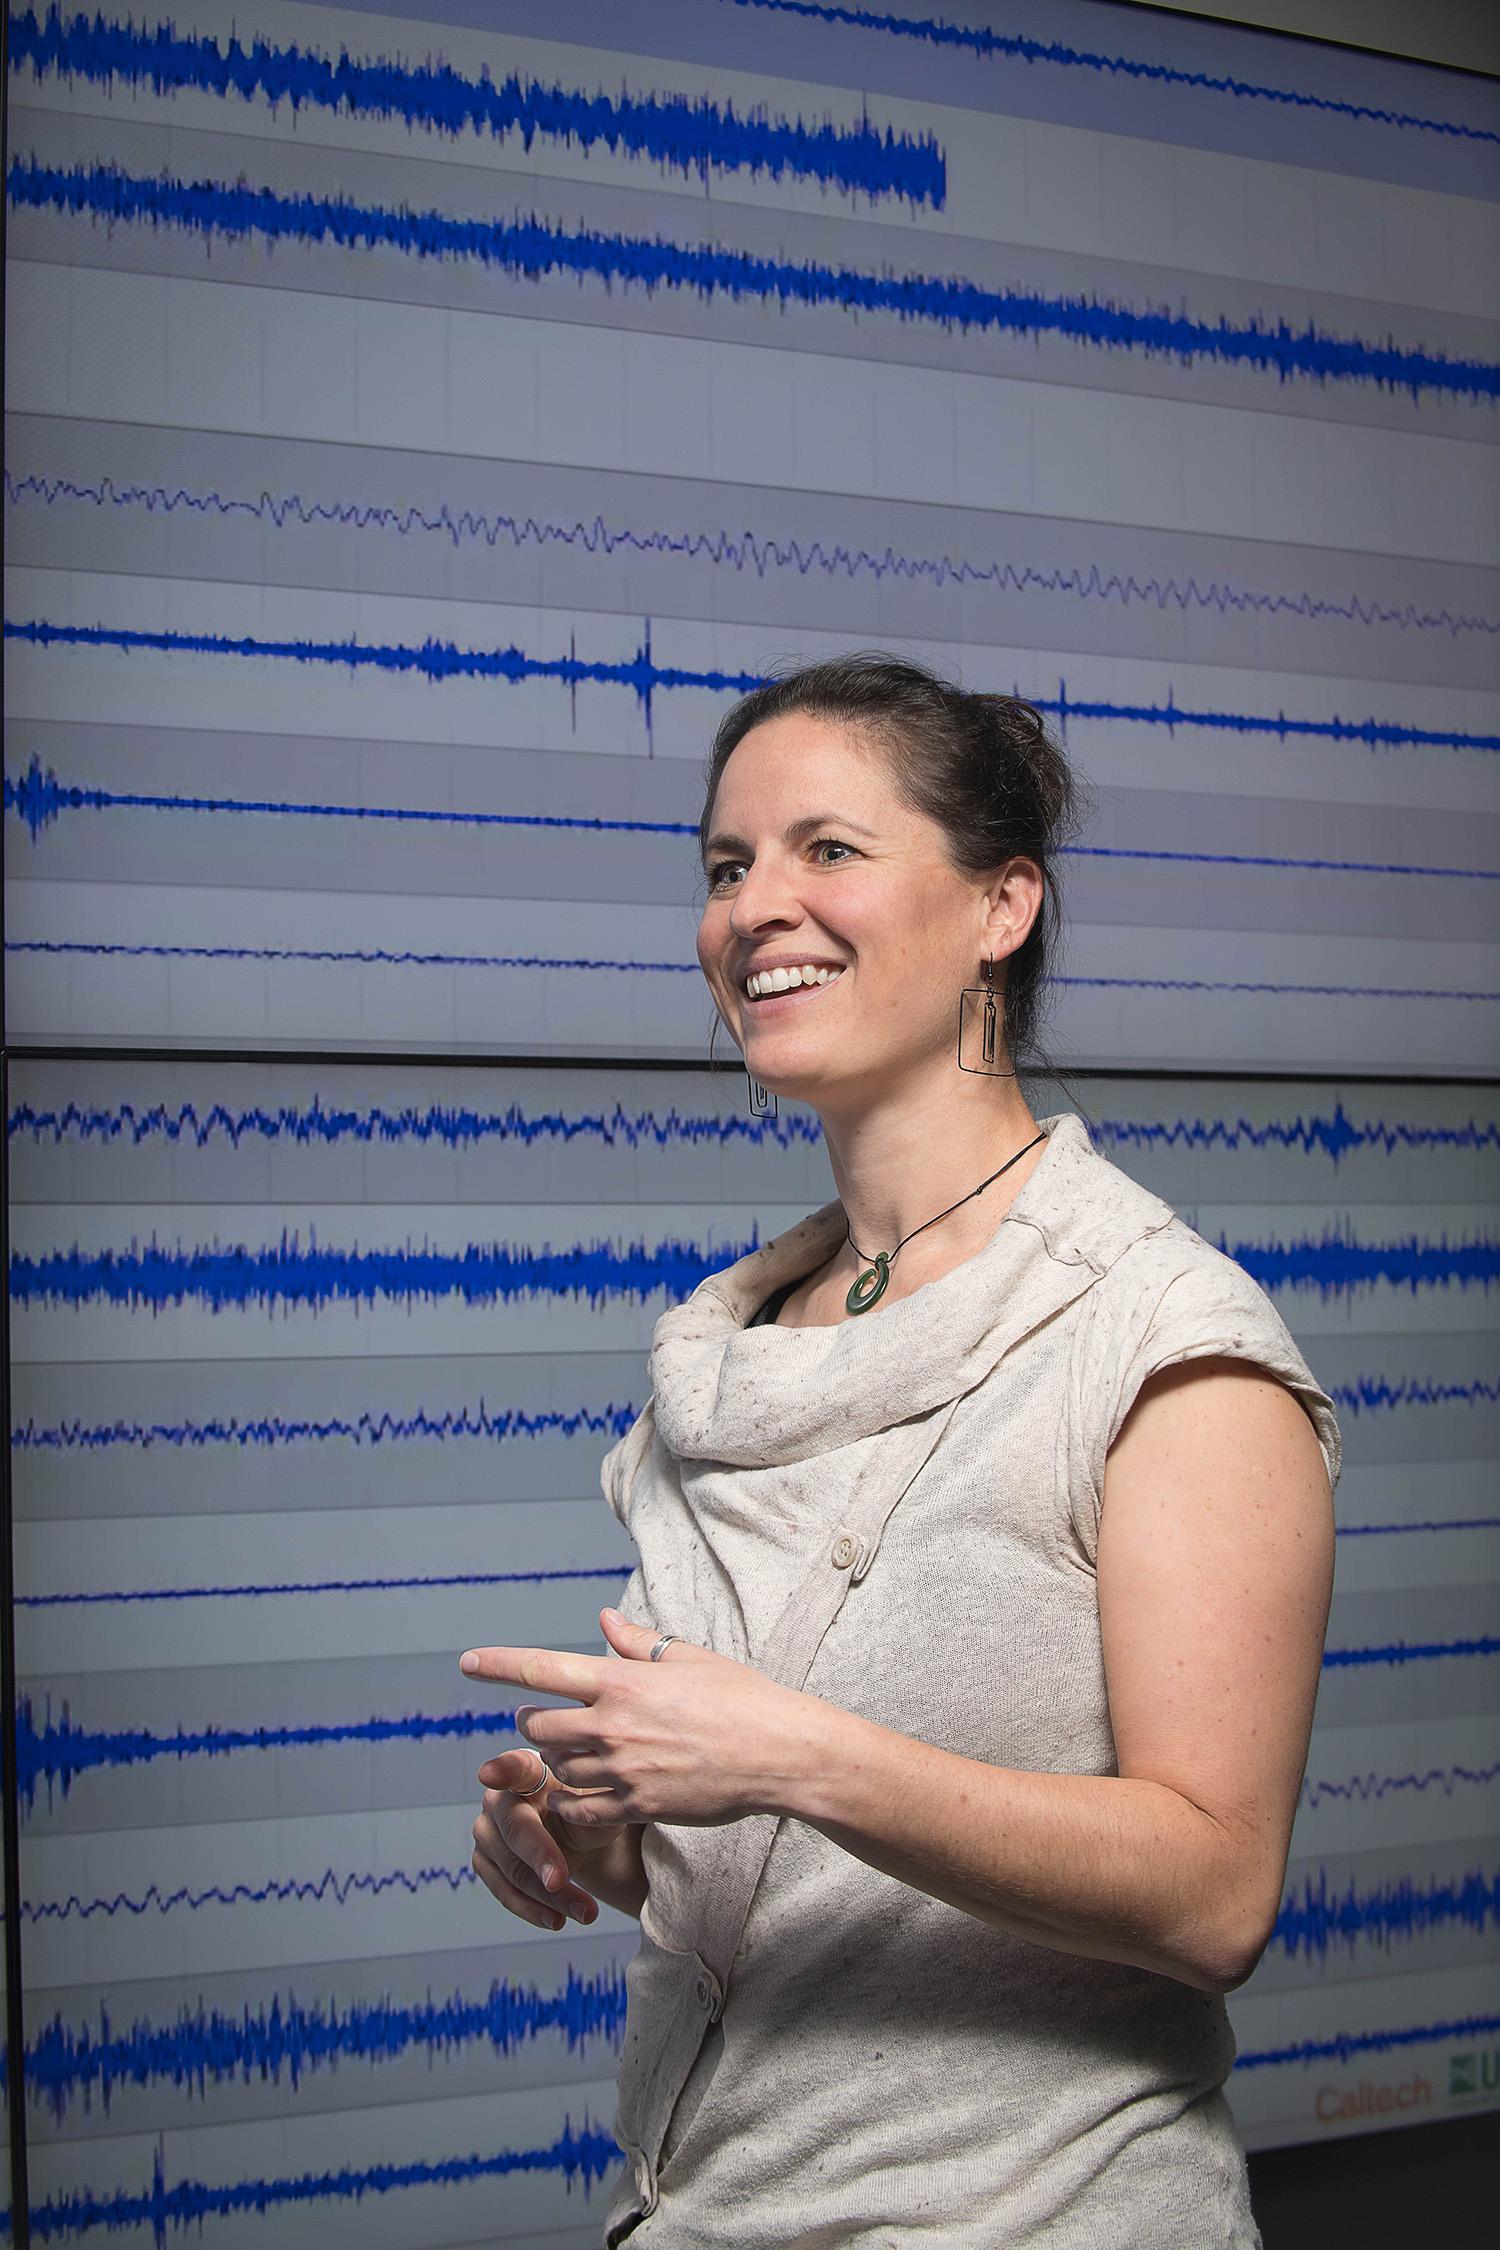 Andrews_Jennifer-Staff_Seismologist-0149.jpg